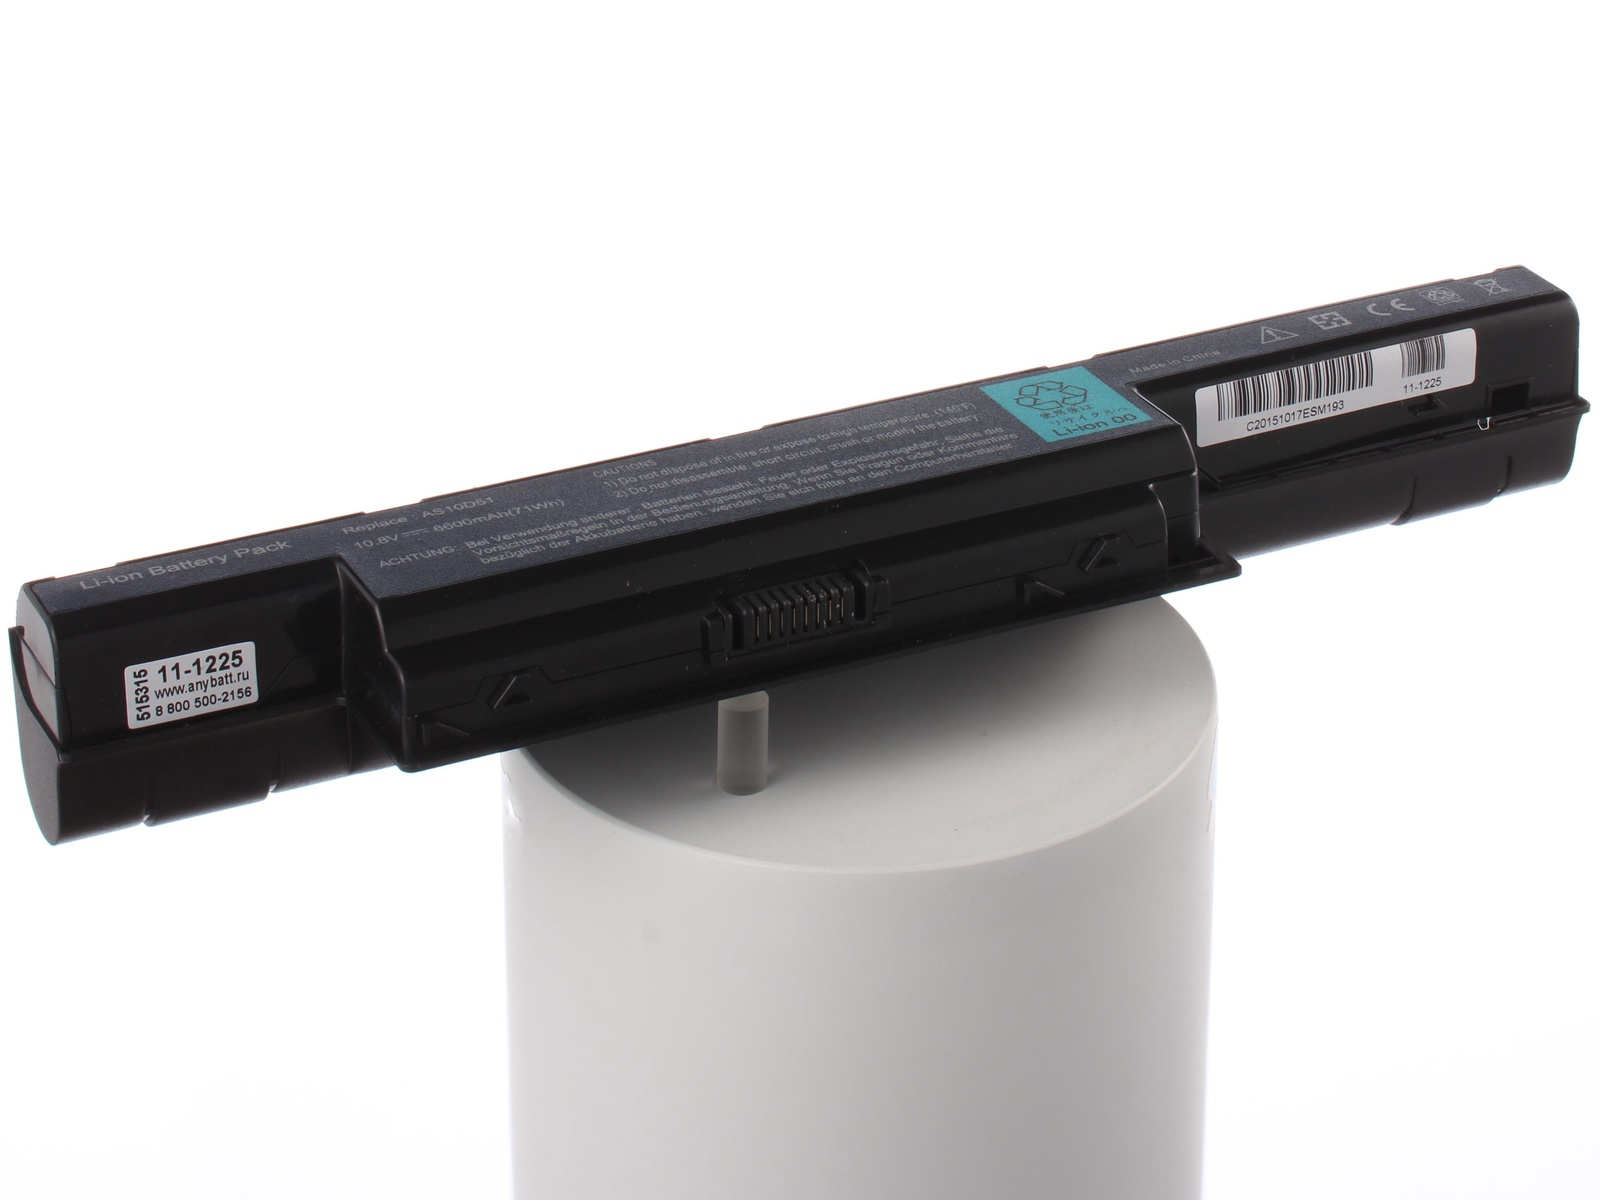 Аккумулятор для ноутбука AnyBatt для Acer Aspire 5551G-P524G32Mi, Aspire 5552G-N834G50Mikk, Aspire 5552G-N974G64Mikk, Aspire 5552G-P342G32Mnkk, Aspire 5552G-P342G32Mnrr, Aspire 5742G-463G32Mikk, Aspire 5742ZG-P622G50Mnkk цены онлайн